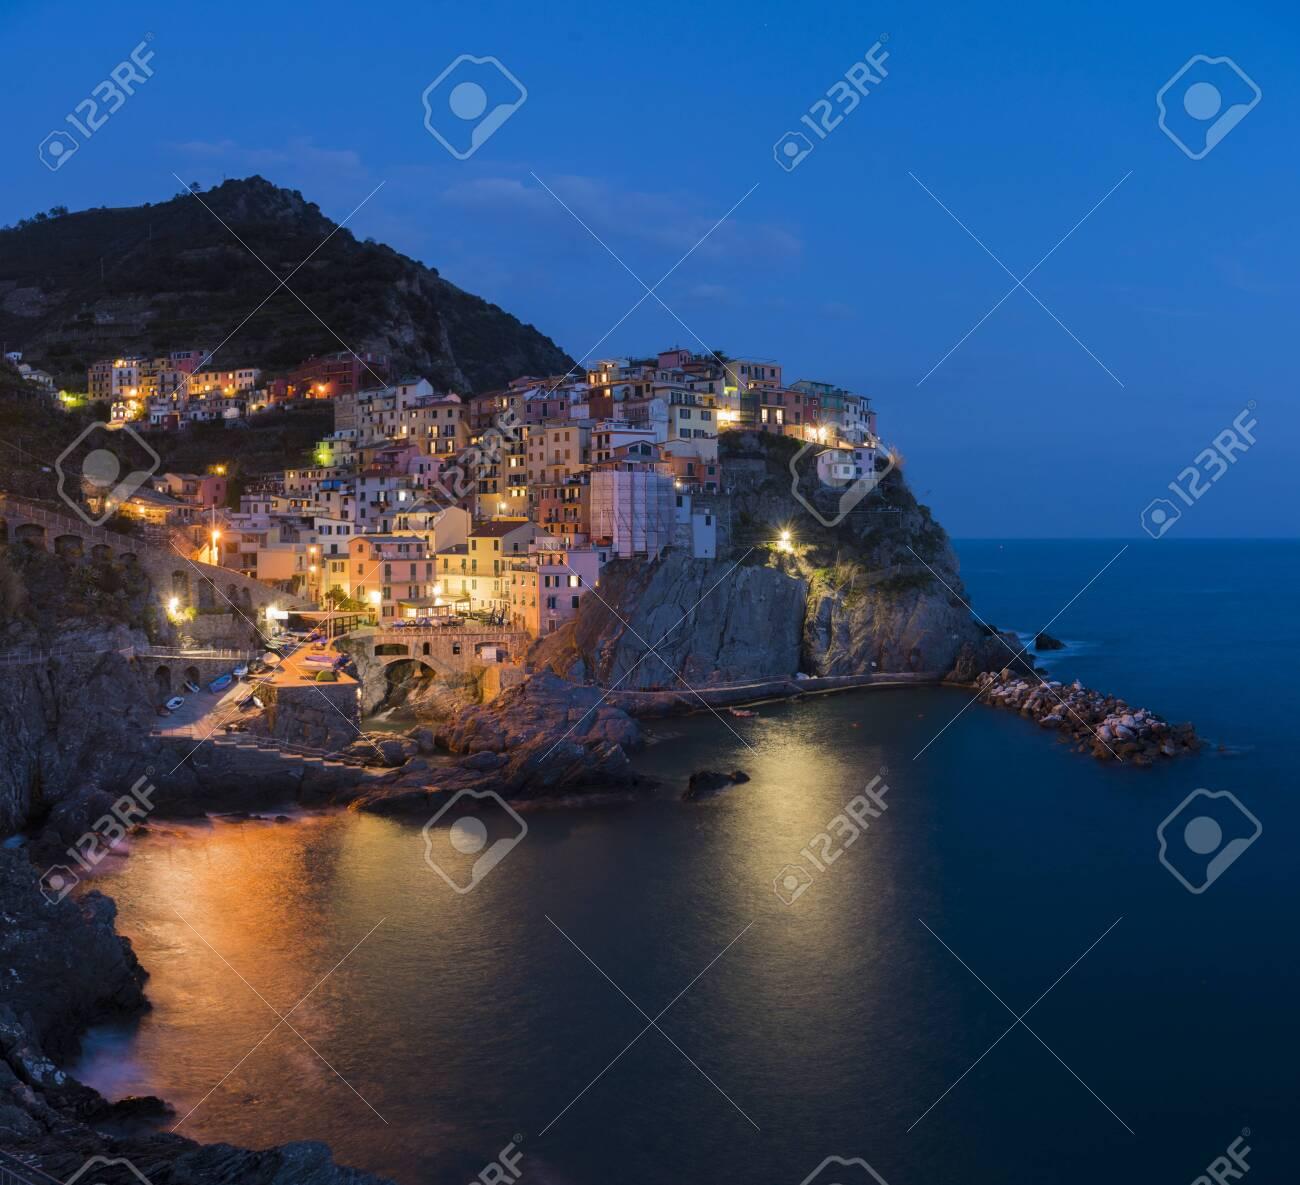 Manarola, 1 of 5 fishing village of Cinque Terre, coastline of Liguria in La Spezia, Italy - 124002186